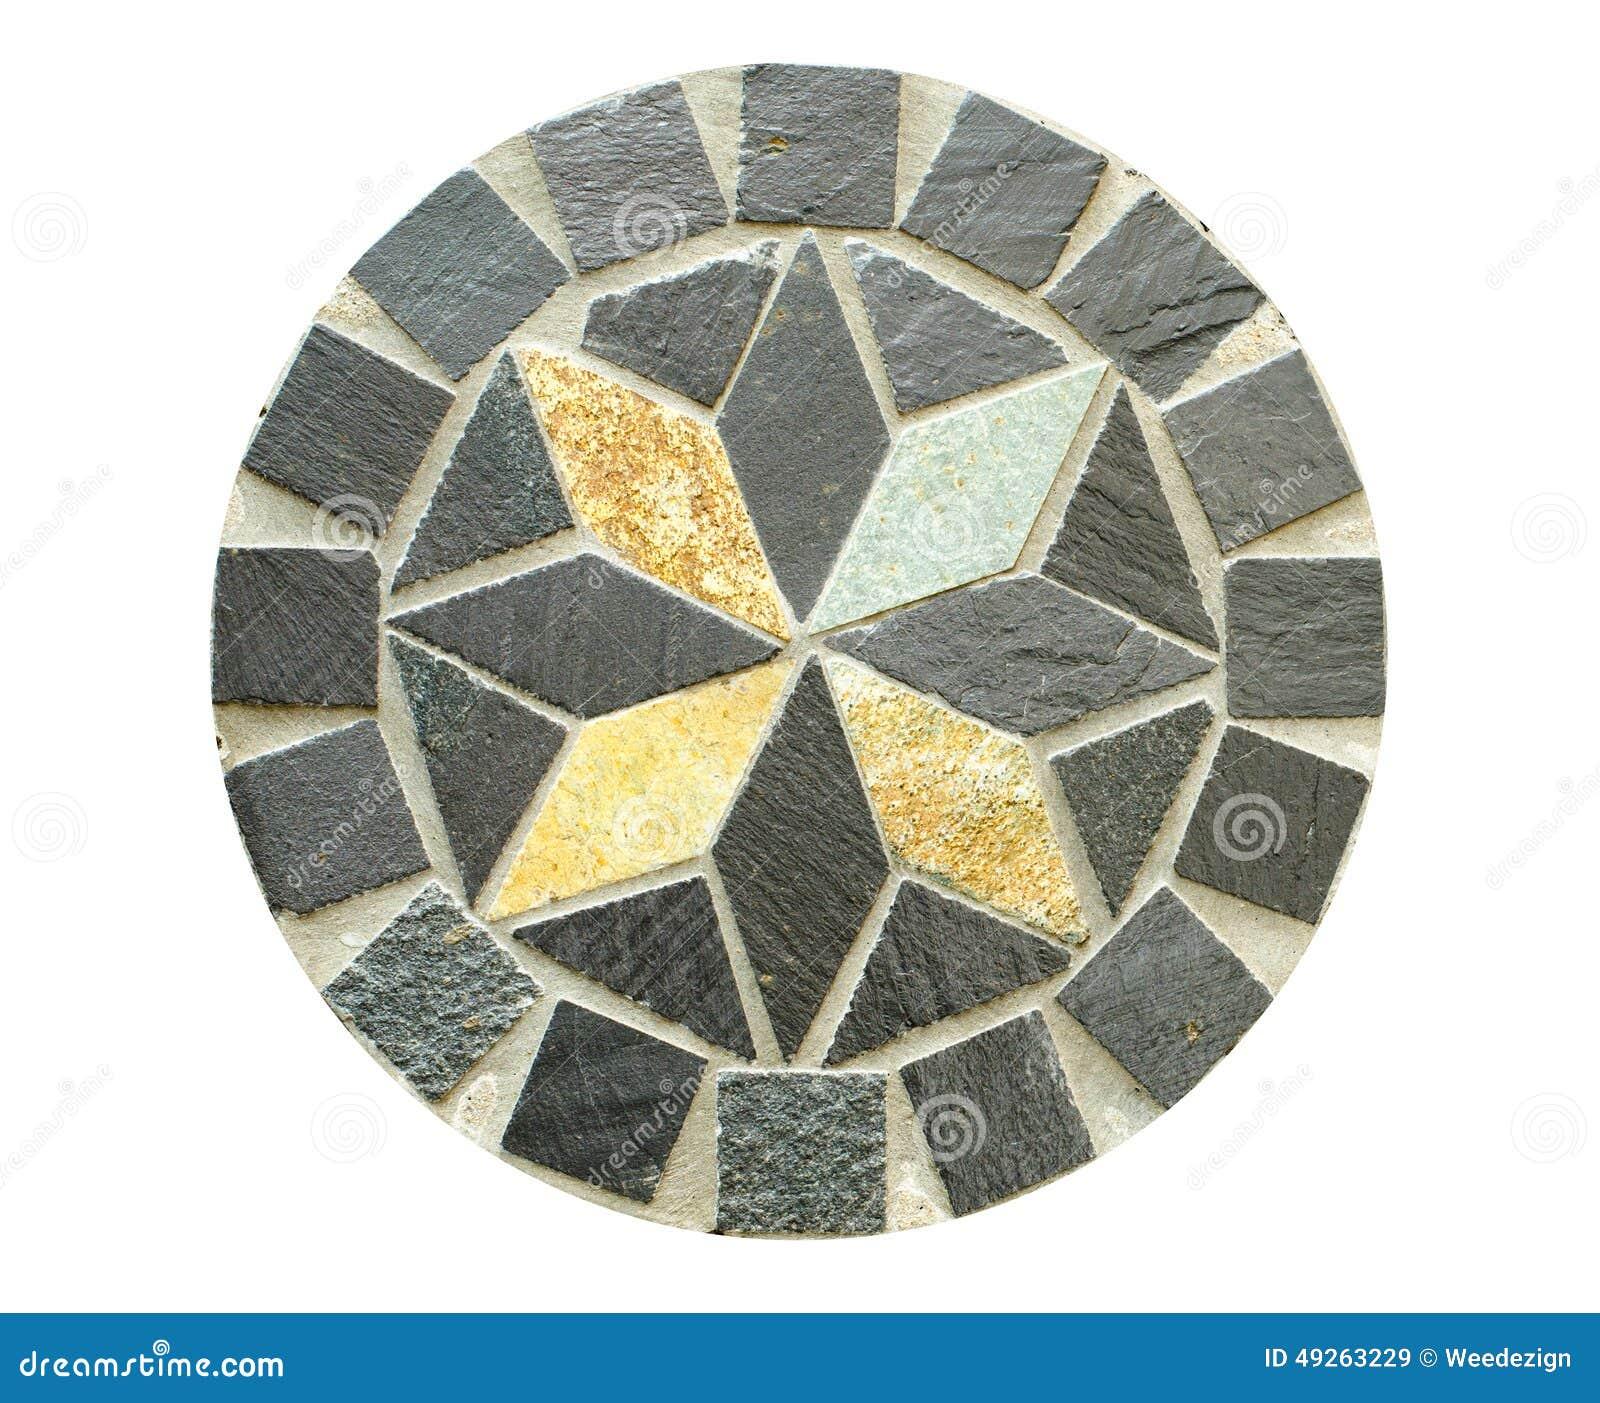 Mosaic Web Design